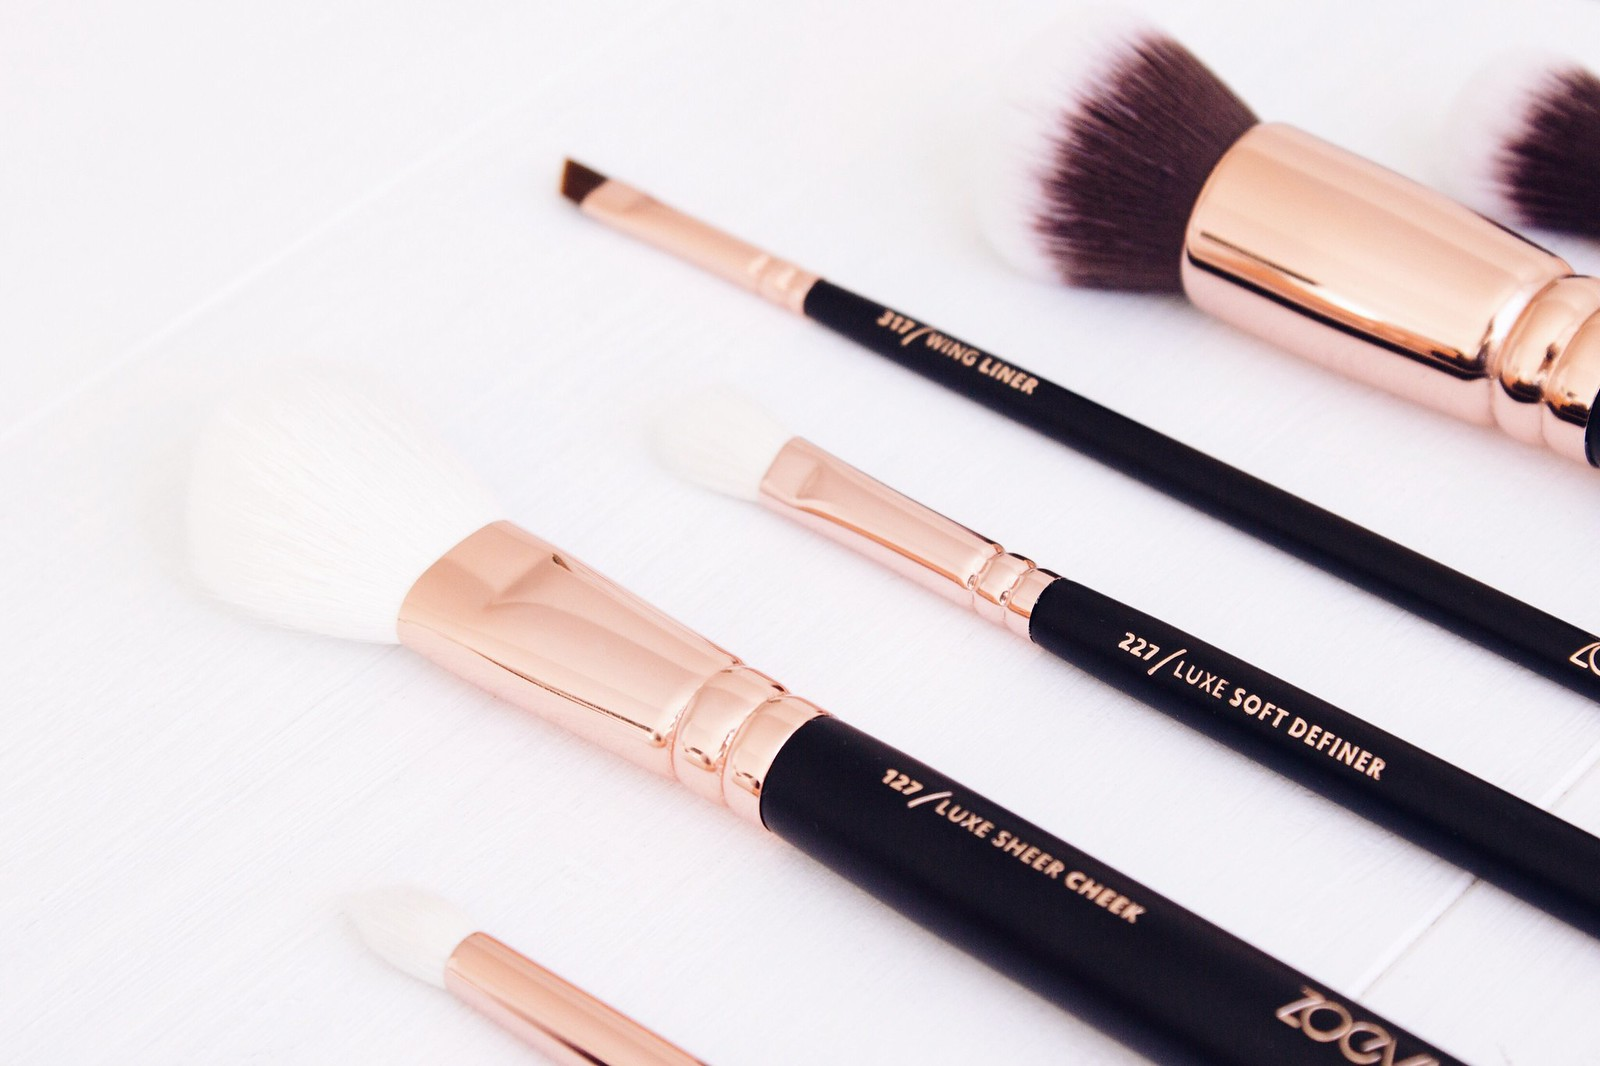 Zoeva Rose Gold Luxury Brush Set Review